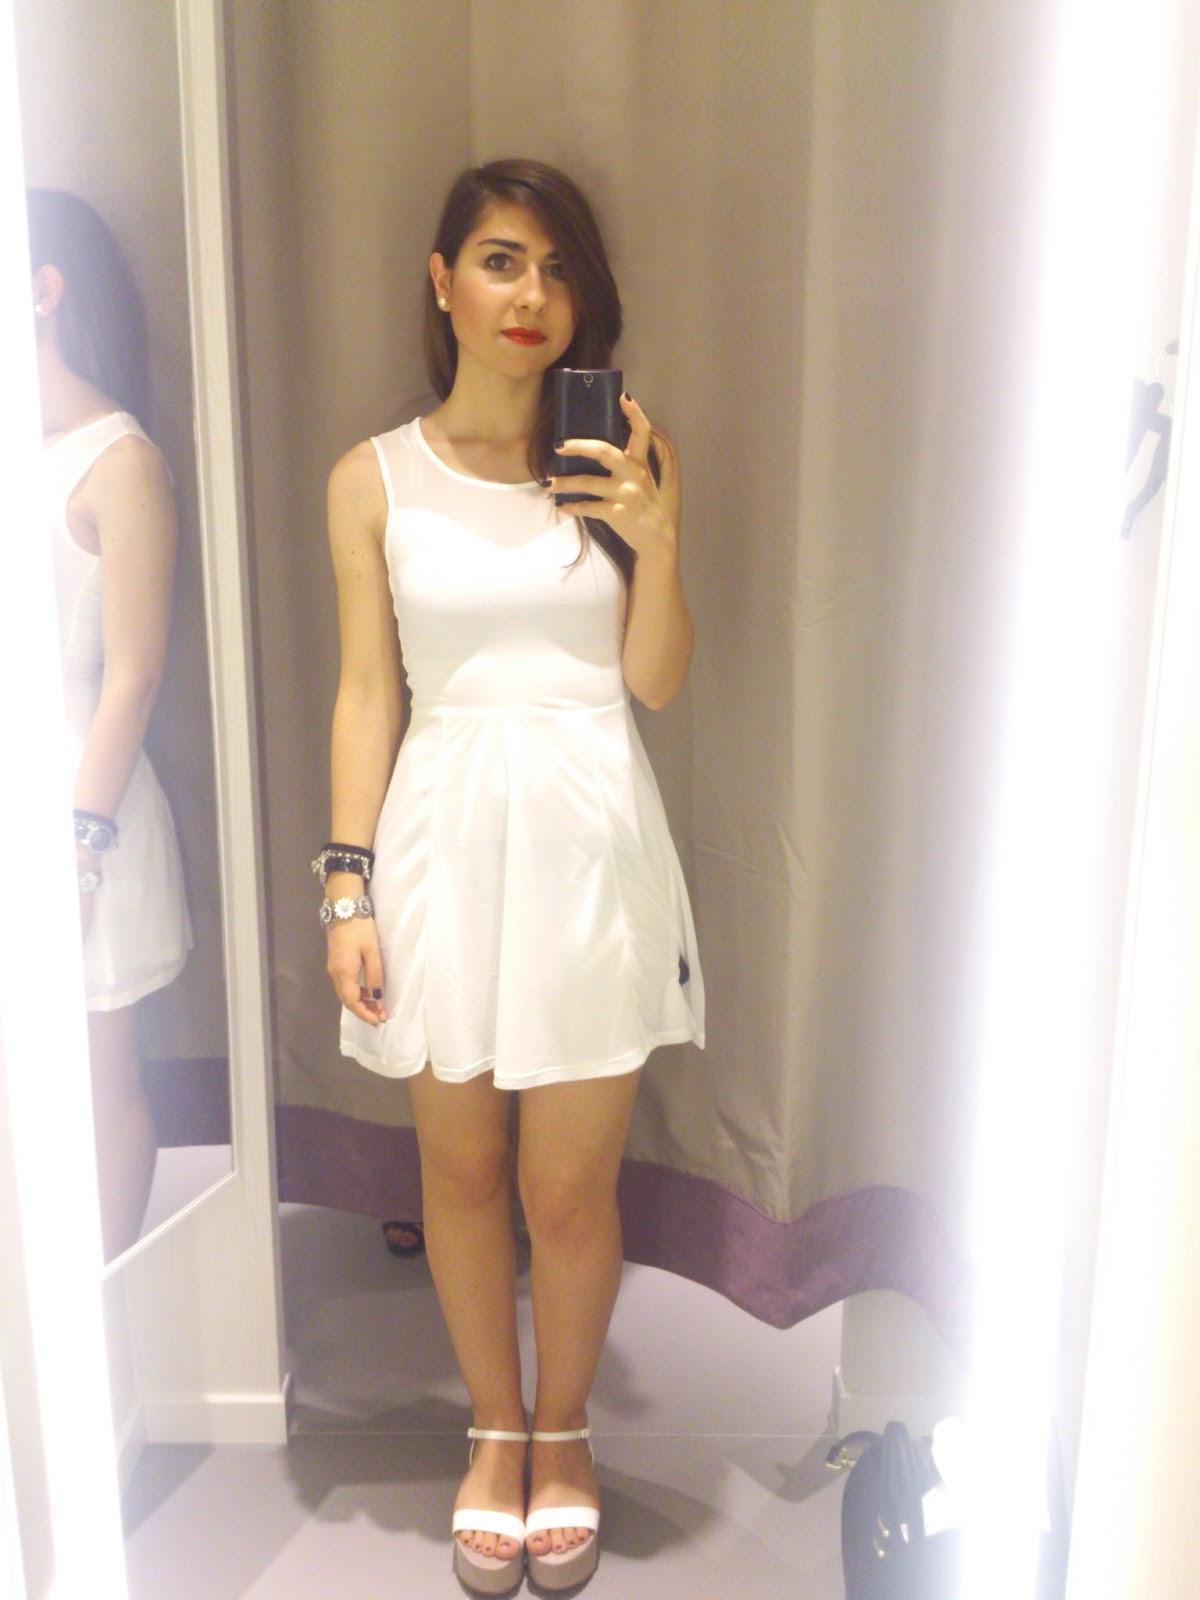 cuneo gemma #hmfinalmenteacuneo outfit bianco cheapischic hm